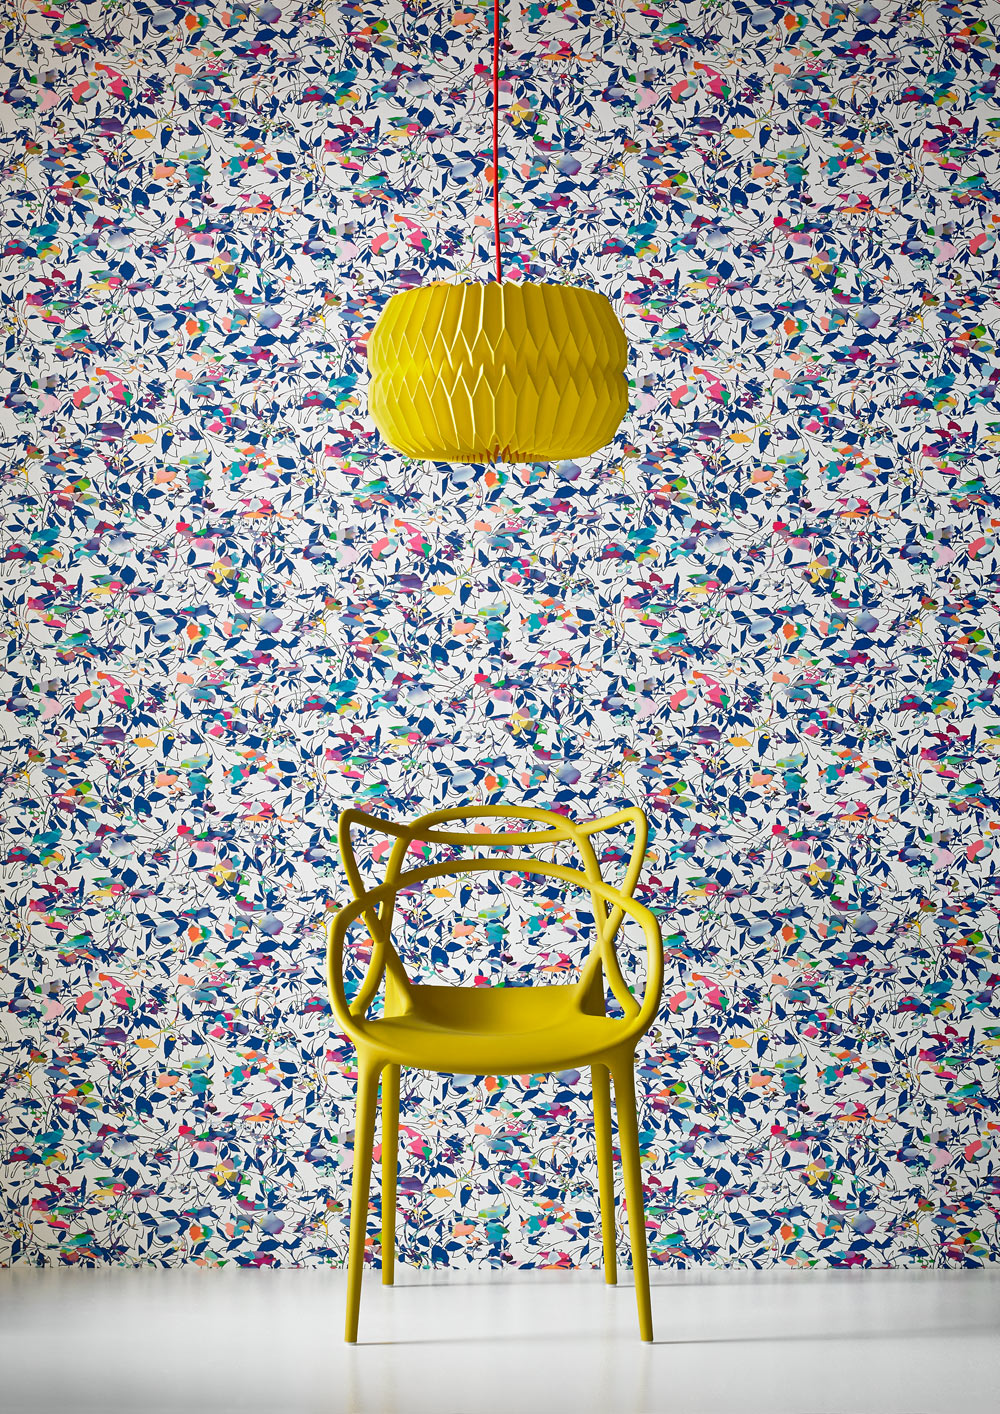 Graham-Brown-Brian-Eno-Flower-Mask-wallpaper-4.jpg